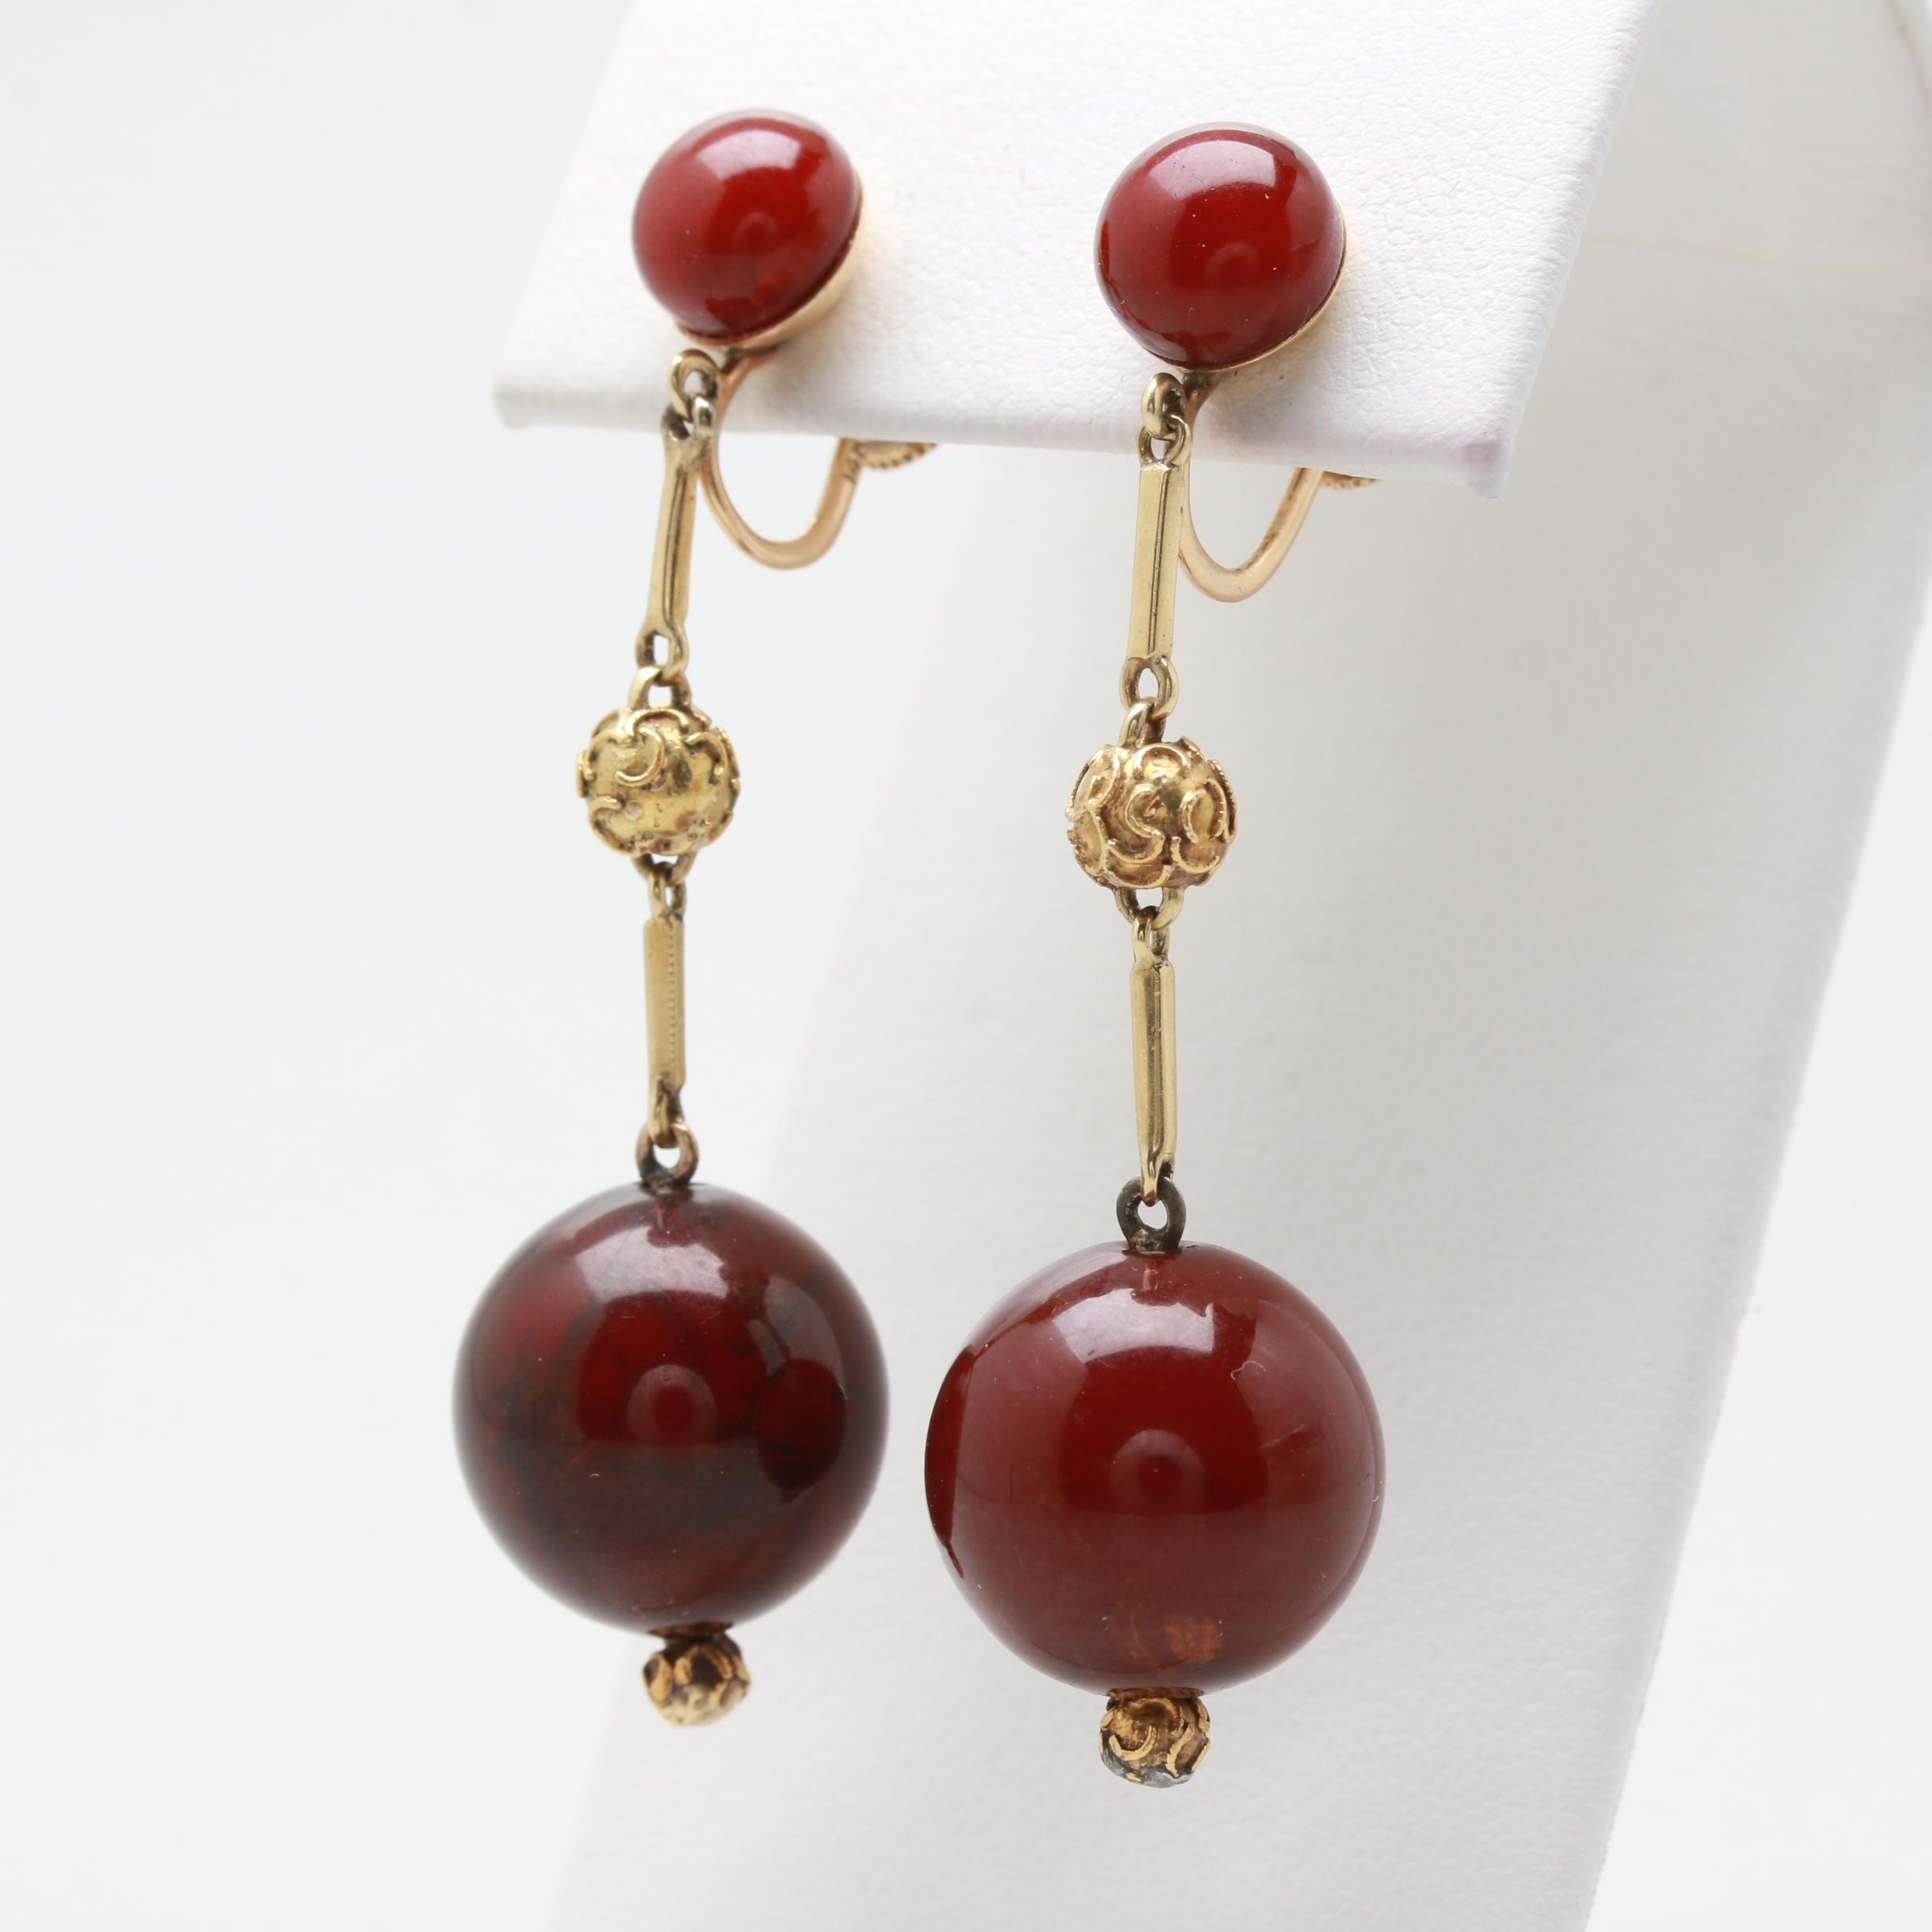 14K Yellow Gold Resin Dangle Earrings